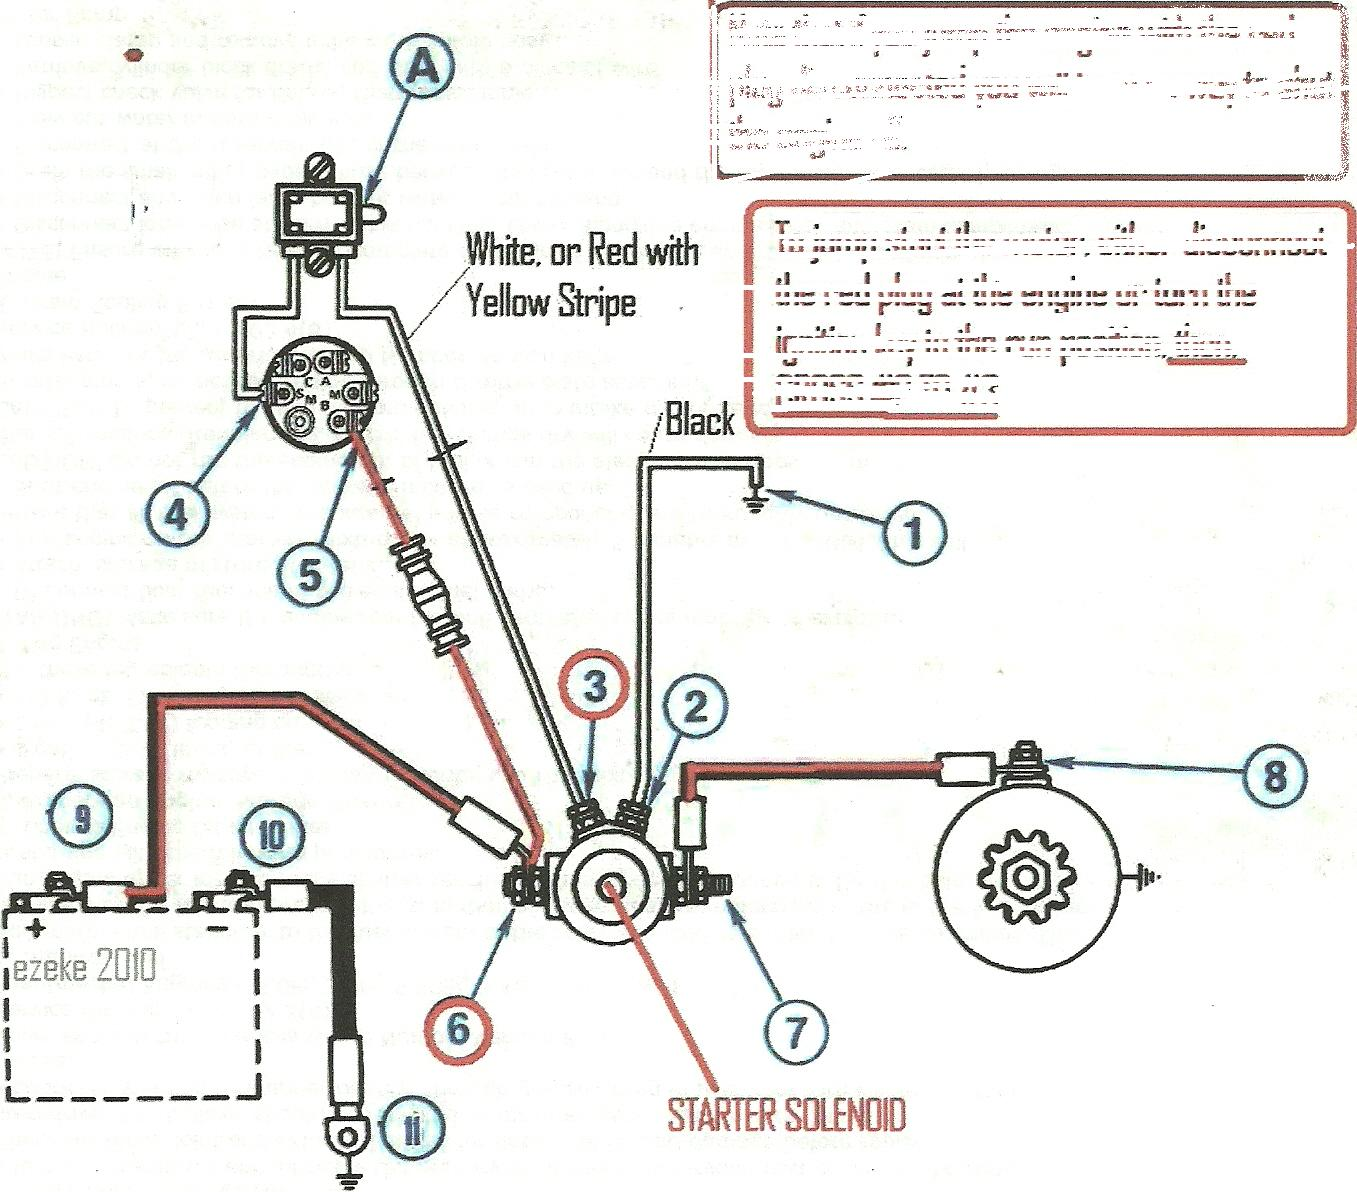 8 Hp Yamaha Outboard Wiring Diagram - Trusted Wiring Diagram Yamaha Ox Wiring Diagram on yamaha solenoid diagram, yamaha motor diagram, yamaha ignition diagram, suzuki quadrunner 160 parts diagram, yamaha steering diagram, yamaha wiring code, yamaha schematics,